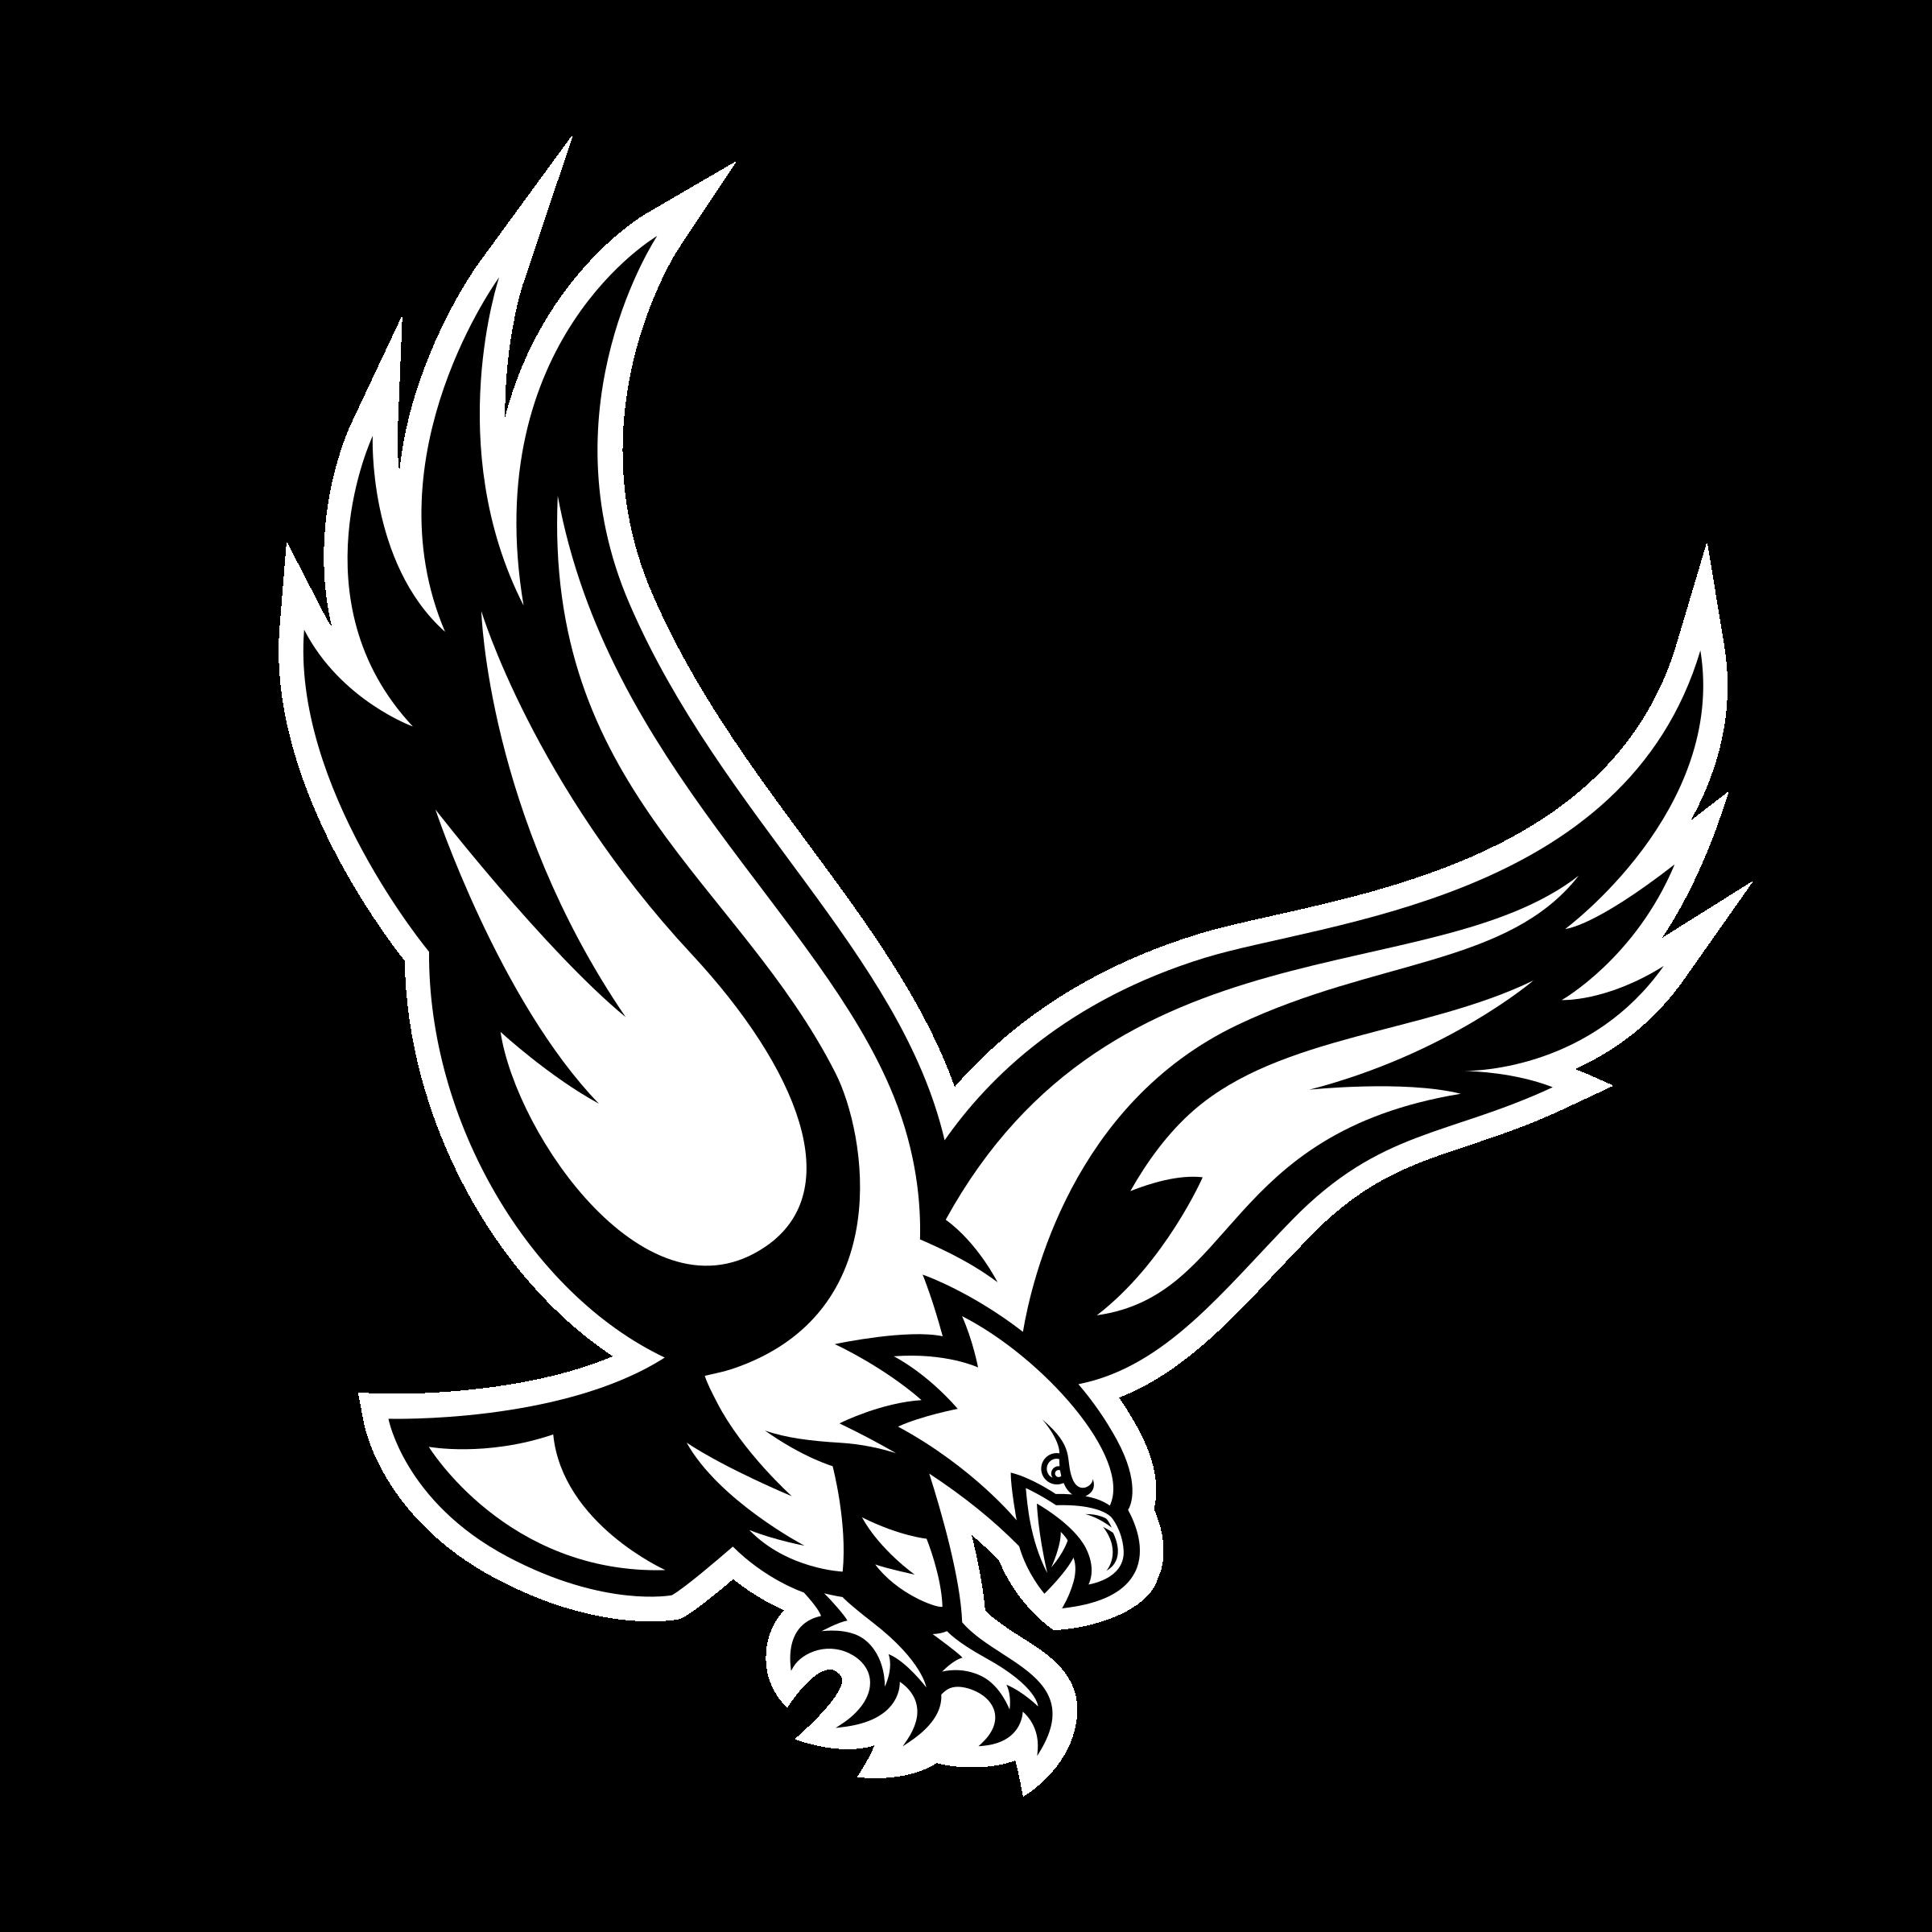 Philadelphia Eagles Bald Eagle - philadelphia eagles png ... - Eagles Logo Silhouette